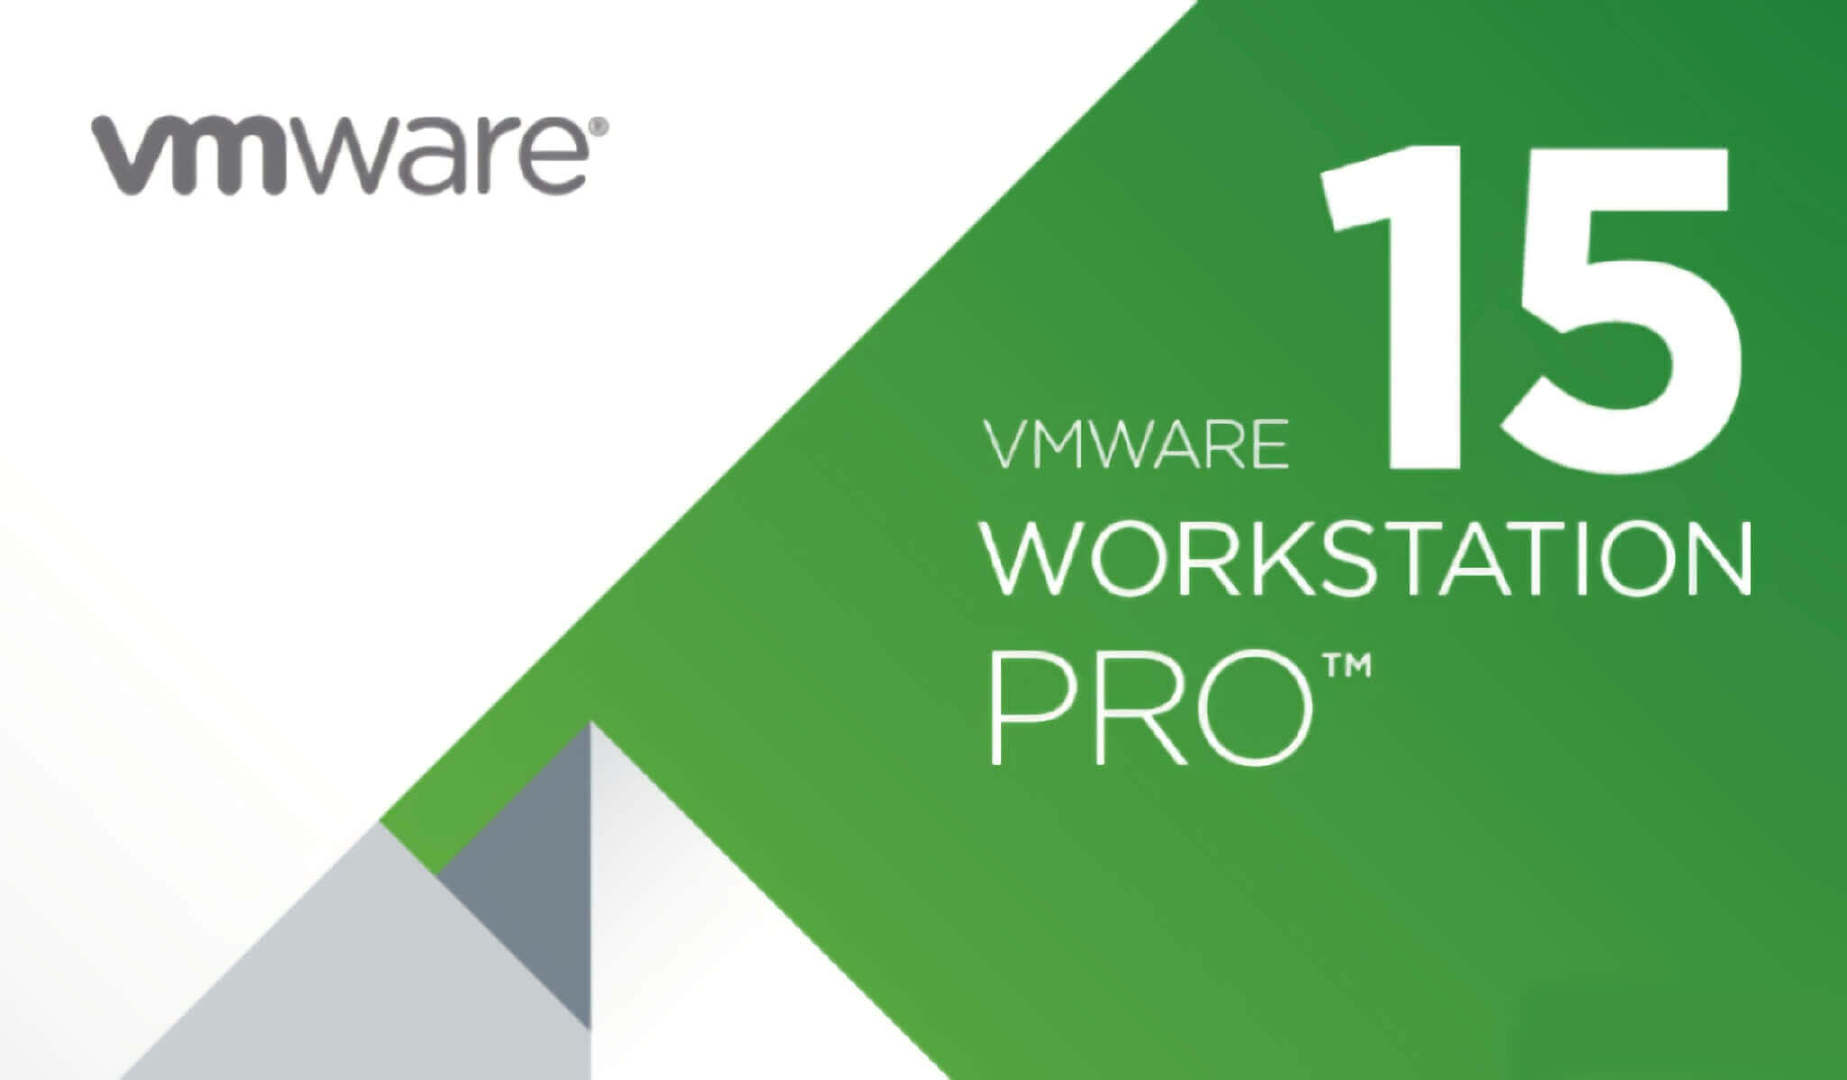 VMware Workstation Pro 15 - Windows平台最强虚拟机软件及永久激活密钥